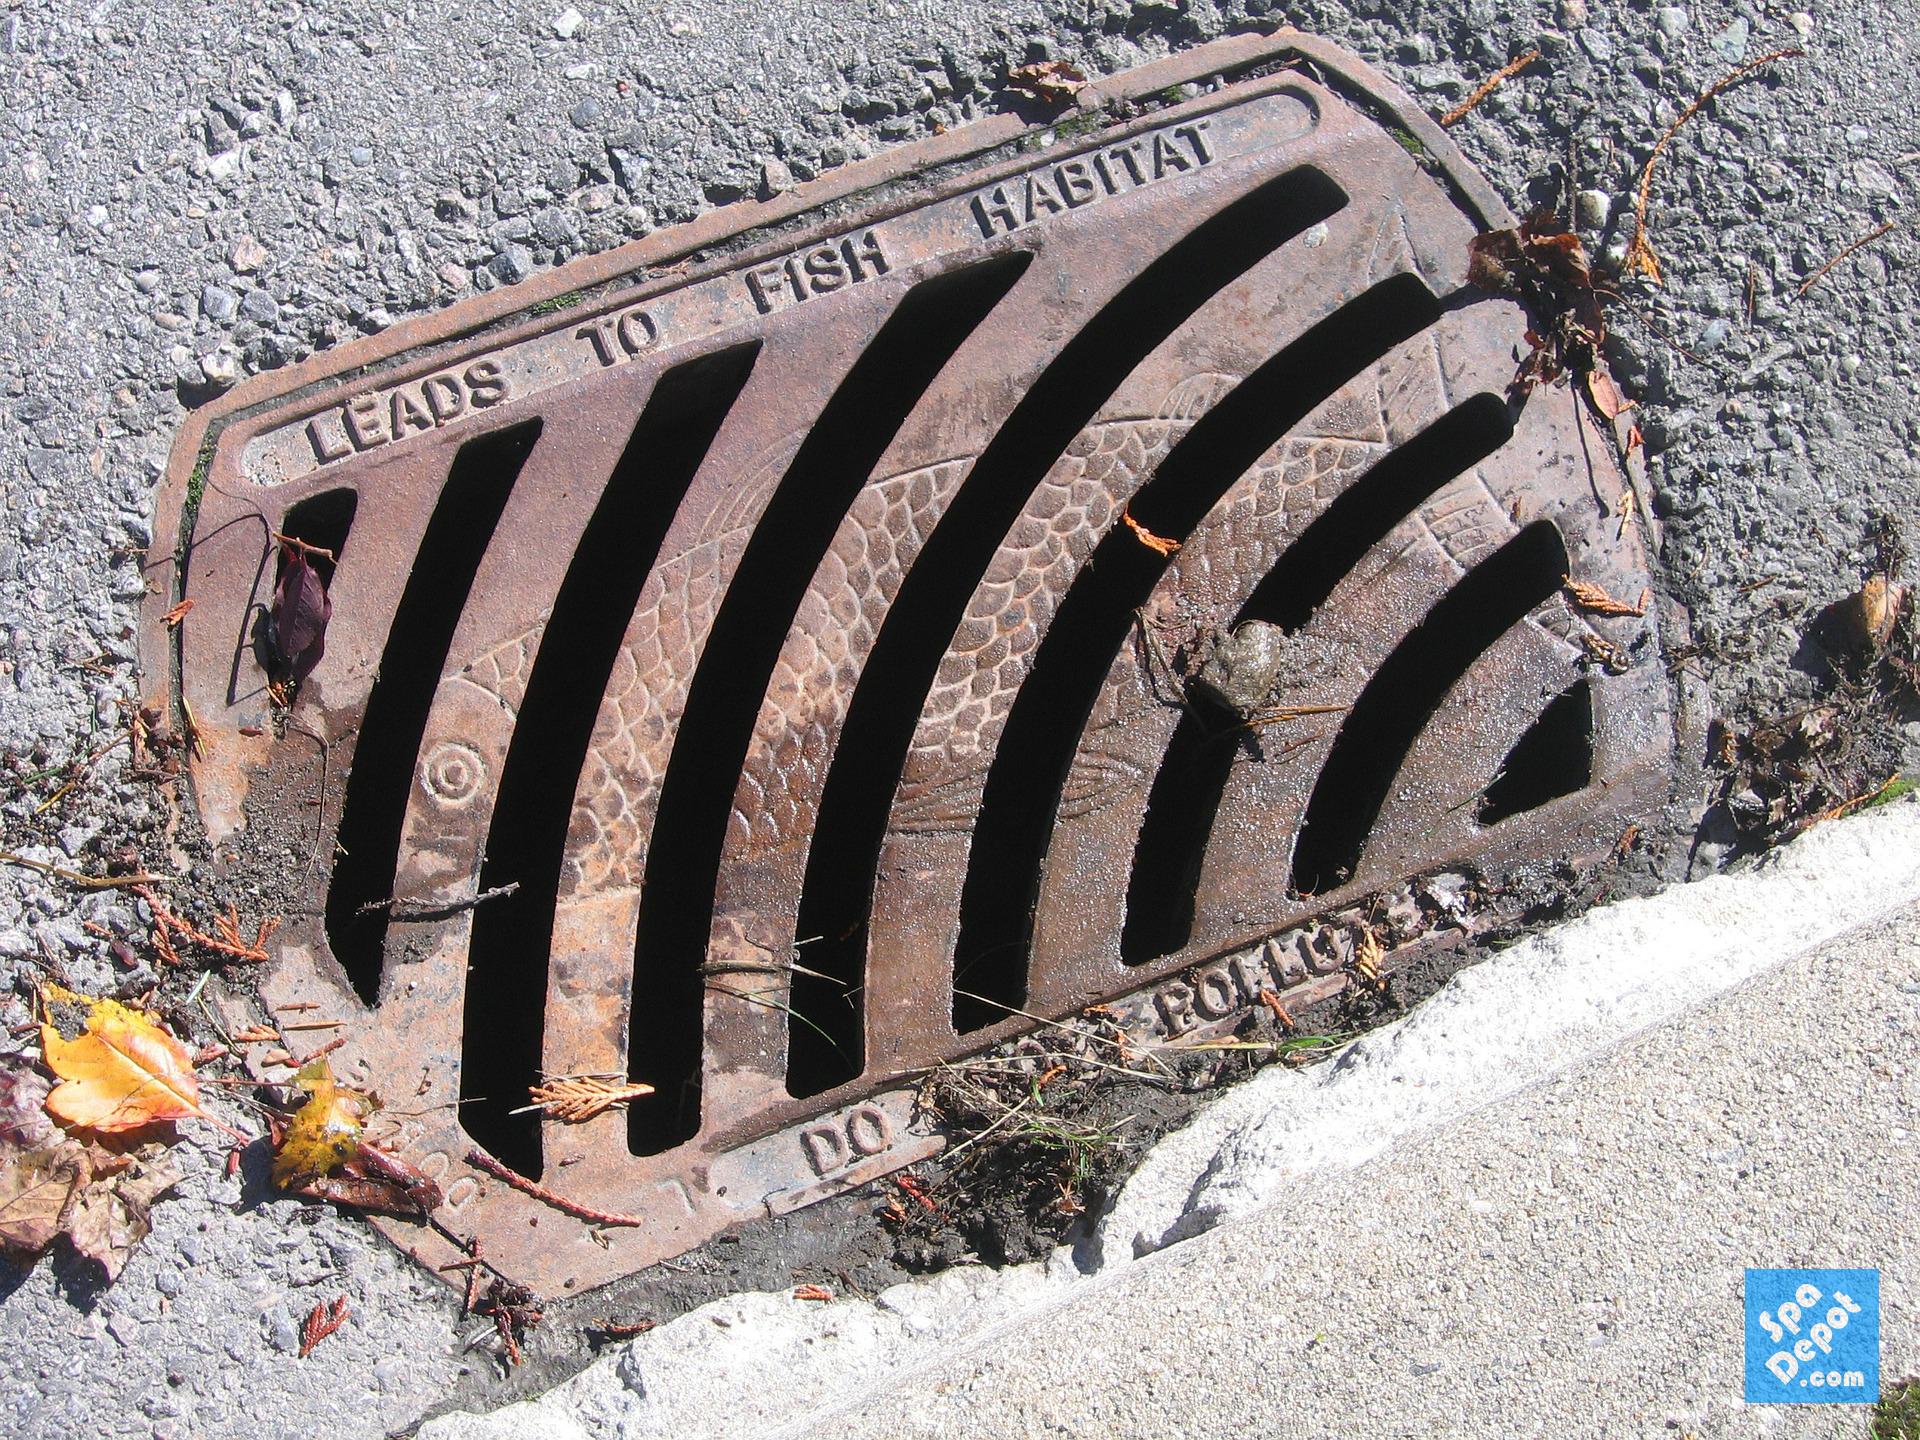 Manhole Drain = Not for draining spas!